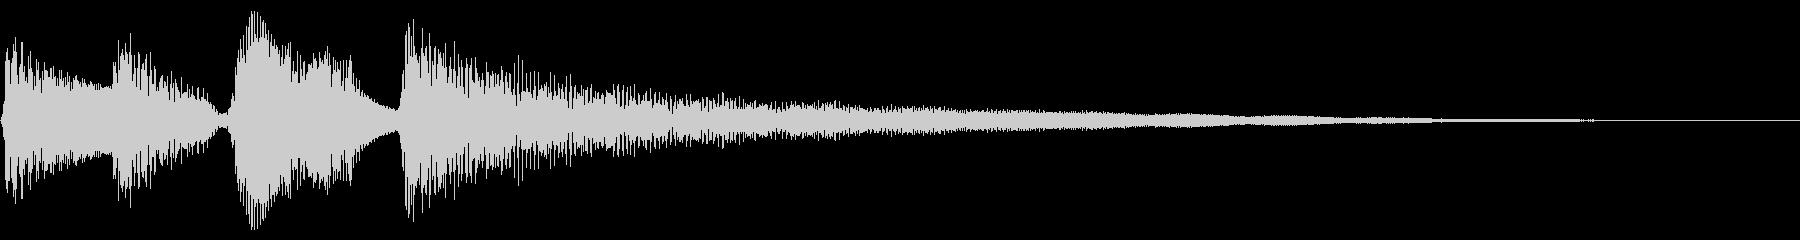 Bright bossa nova nylon guitar's unreproduced waveform